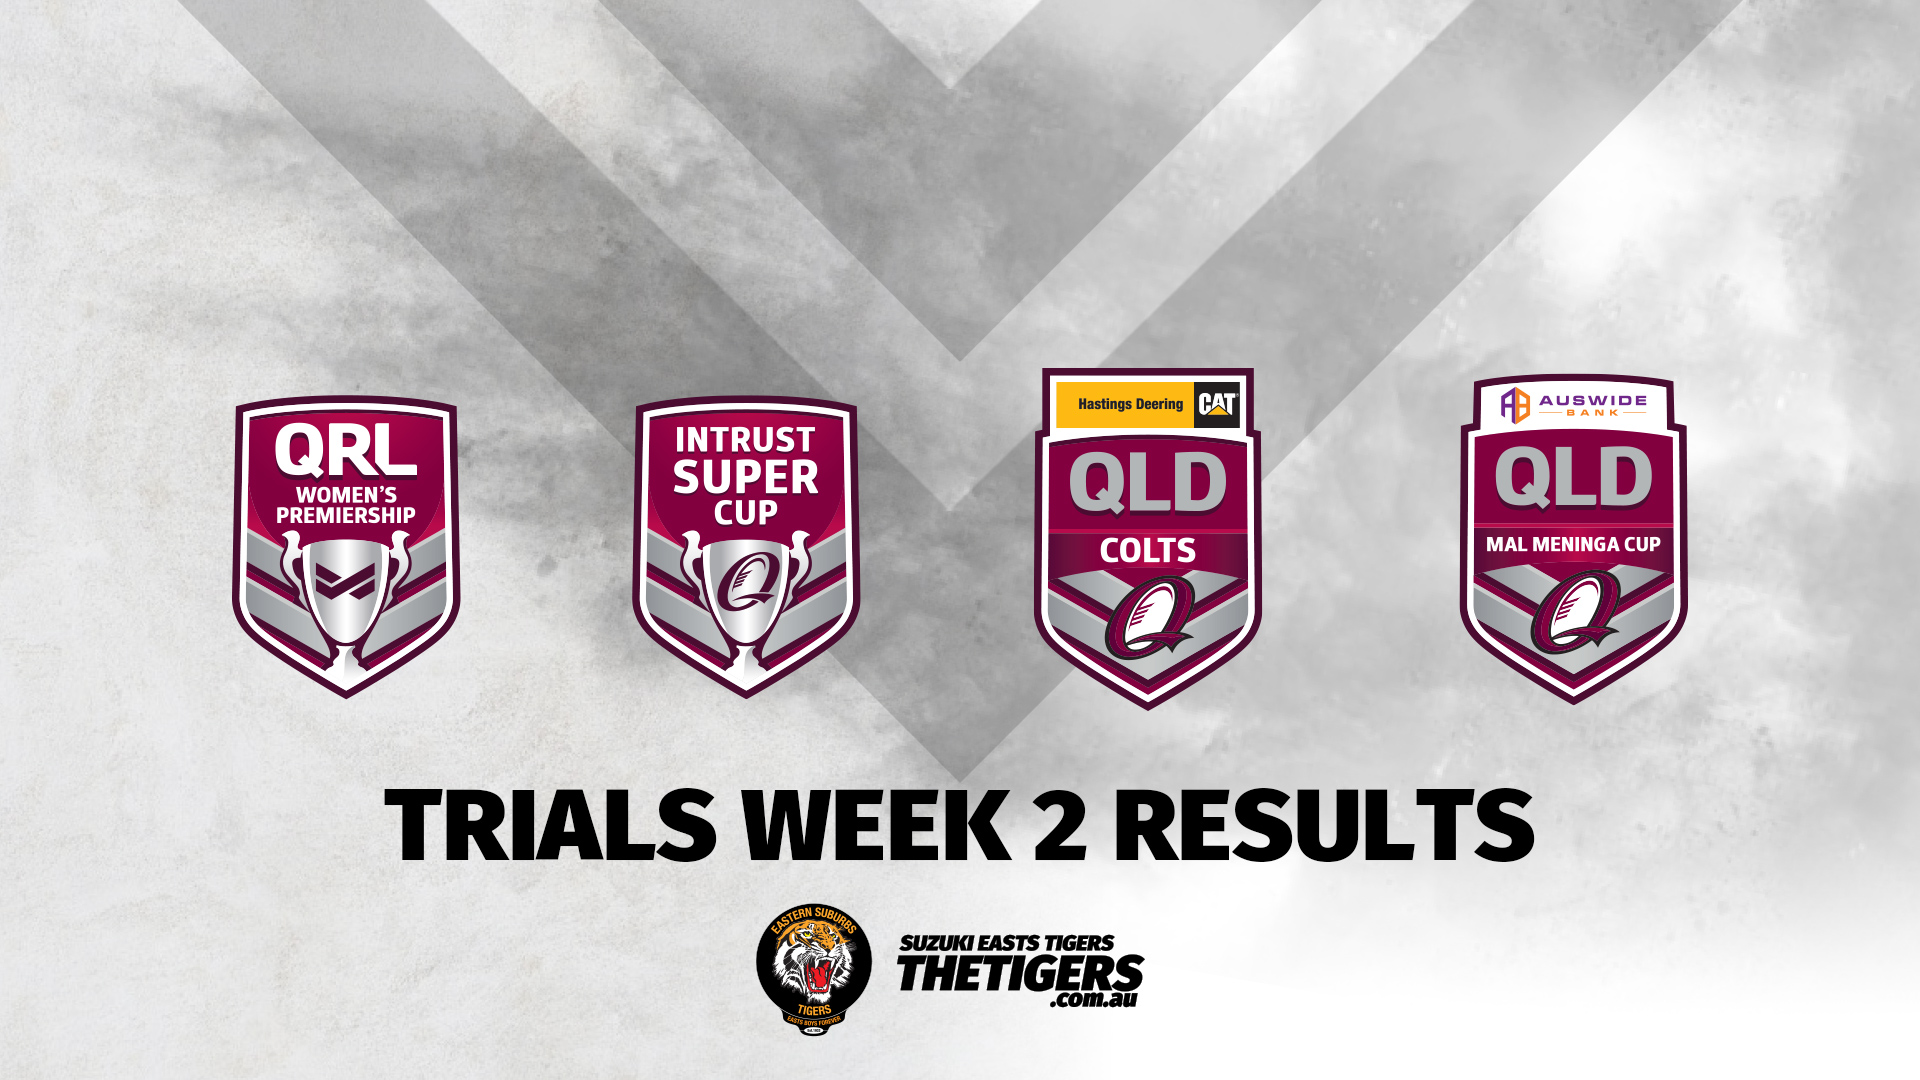 2020 Trials Week 2 Results